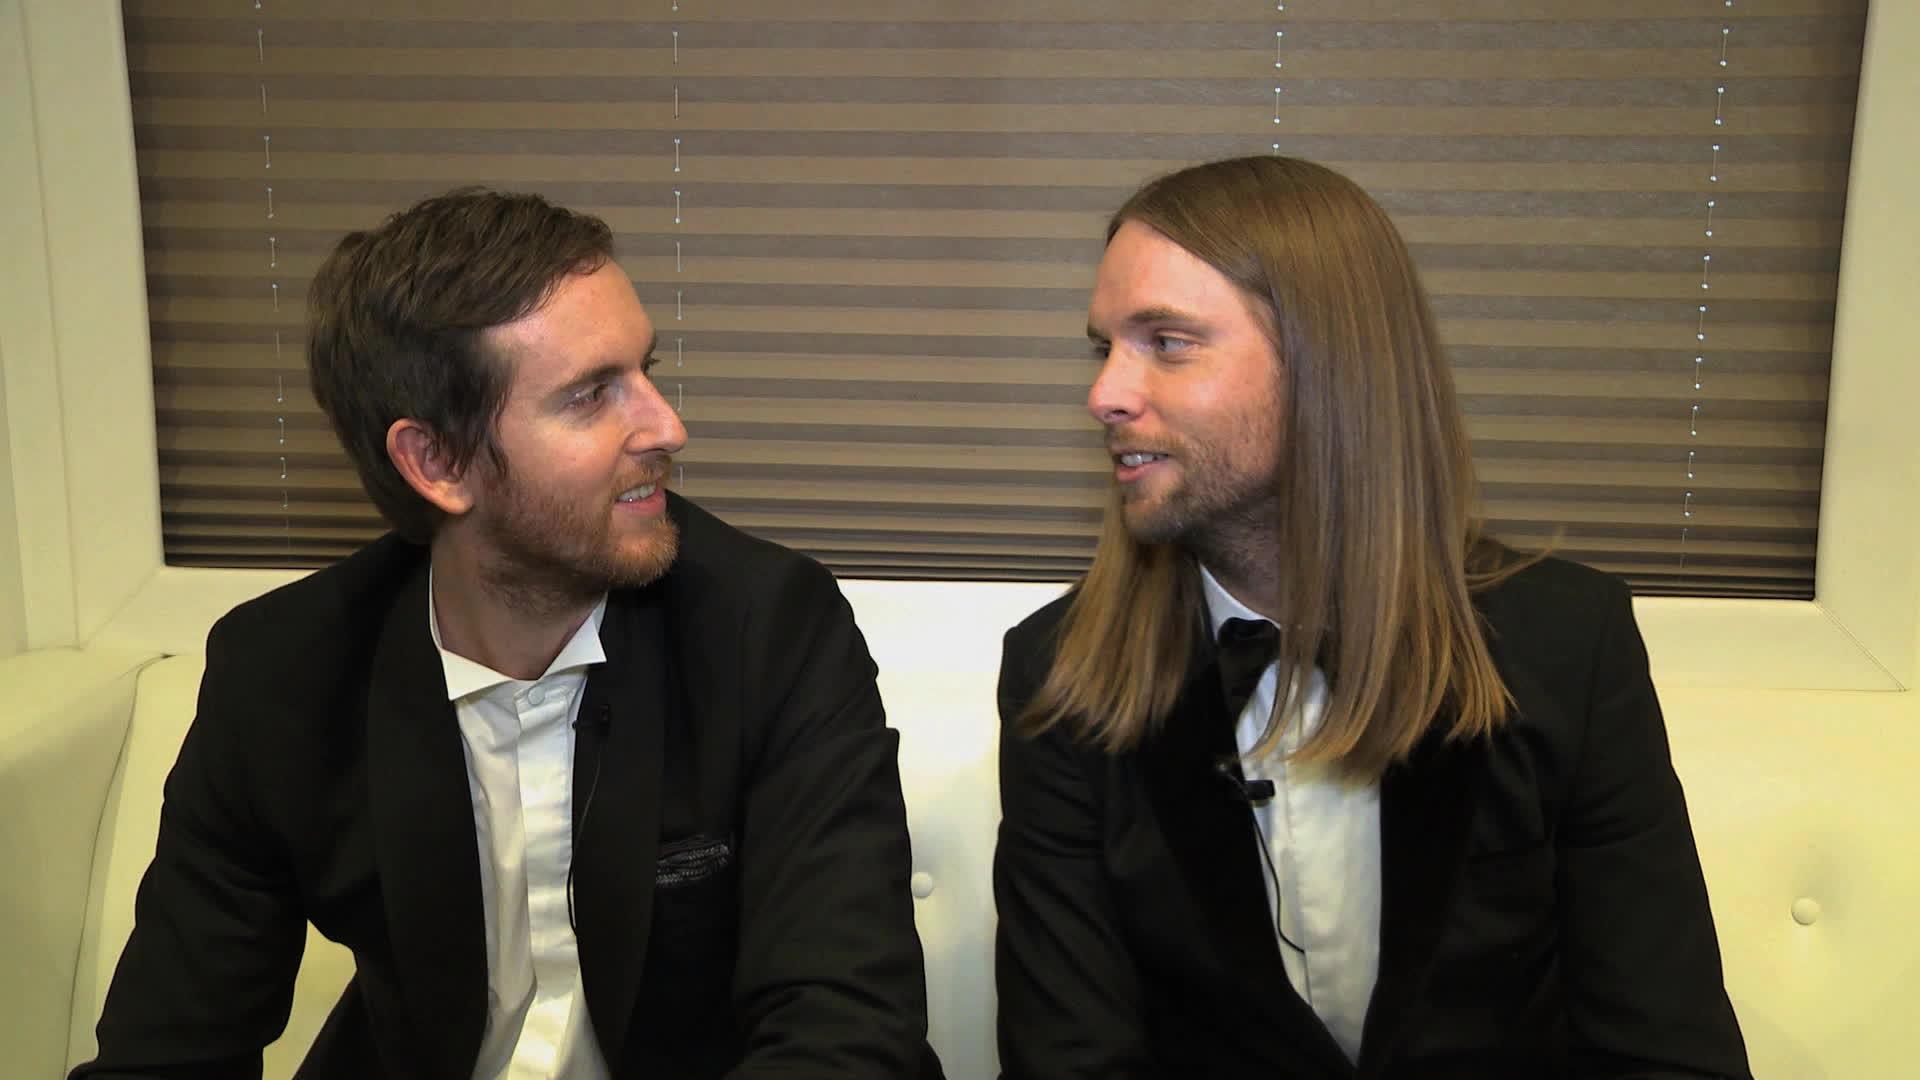 Maroon 5, Maroon 5 - Valentine's Day